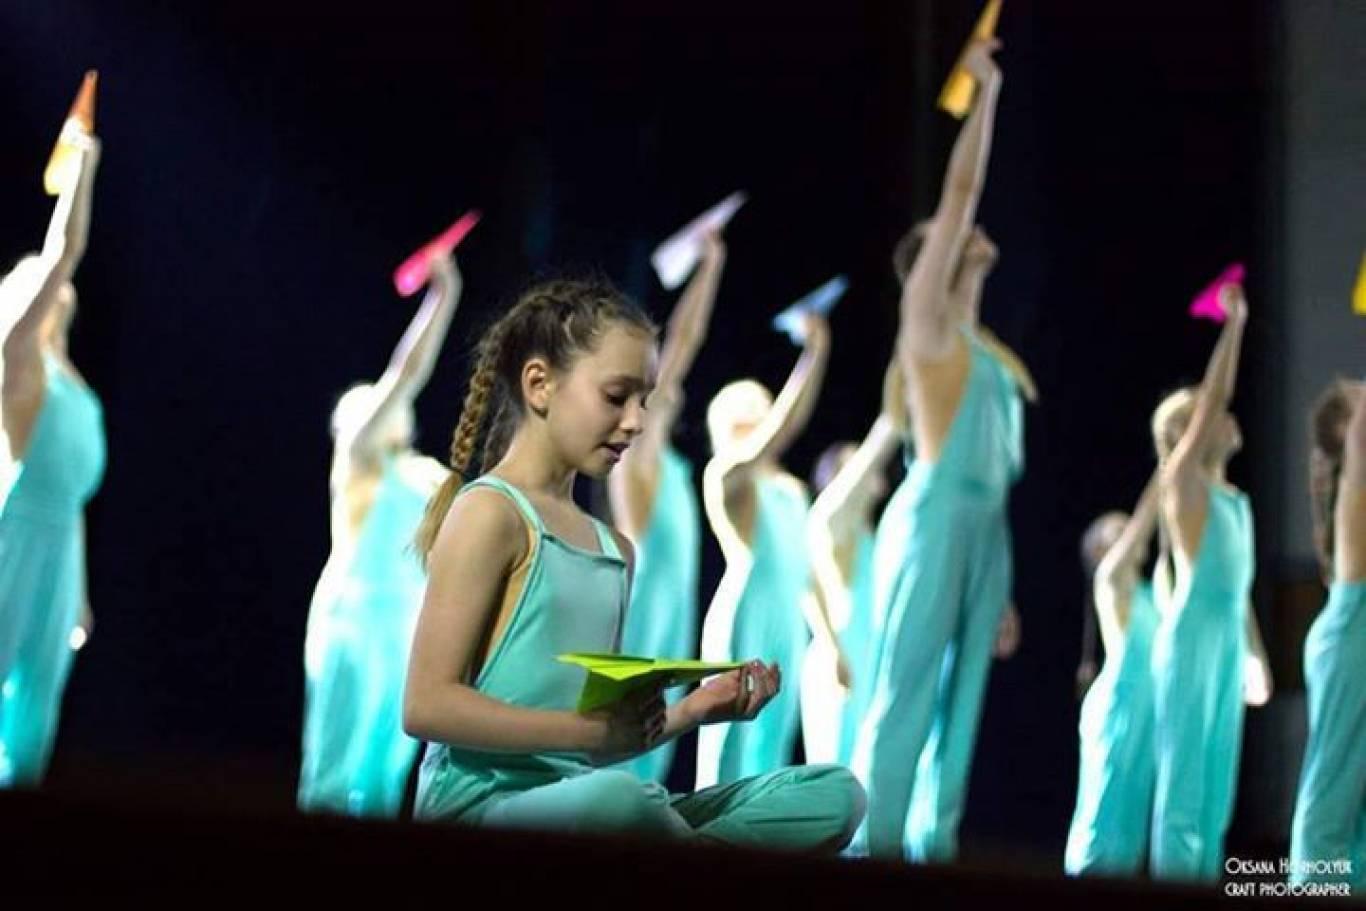 Дети перемен https://moemisto.ua/od/tantsevalnyie-spektakli-deti-peremen-155892.html